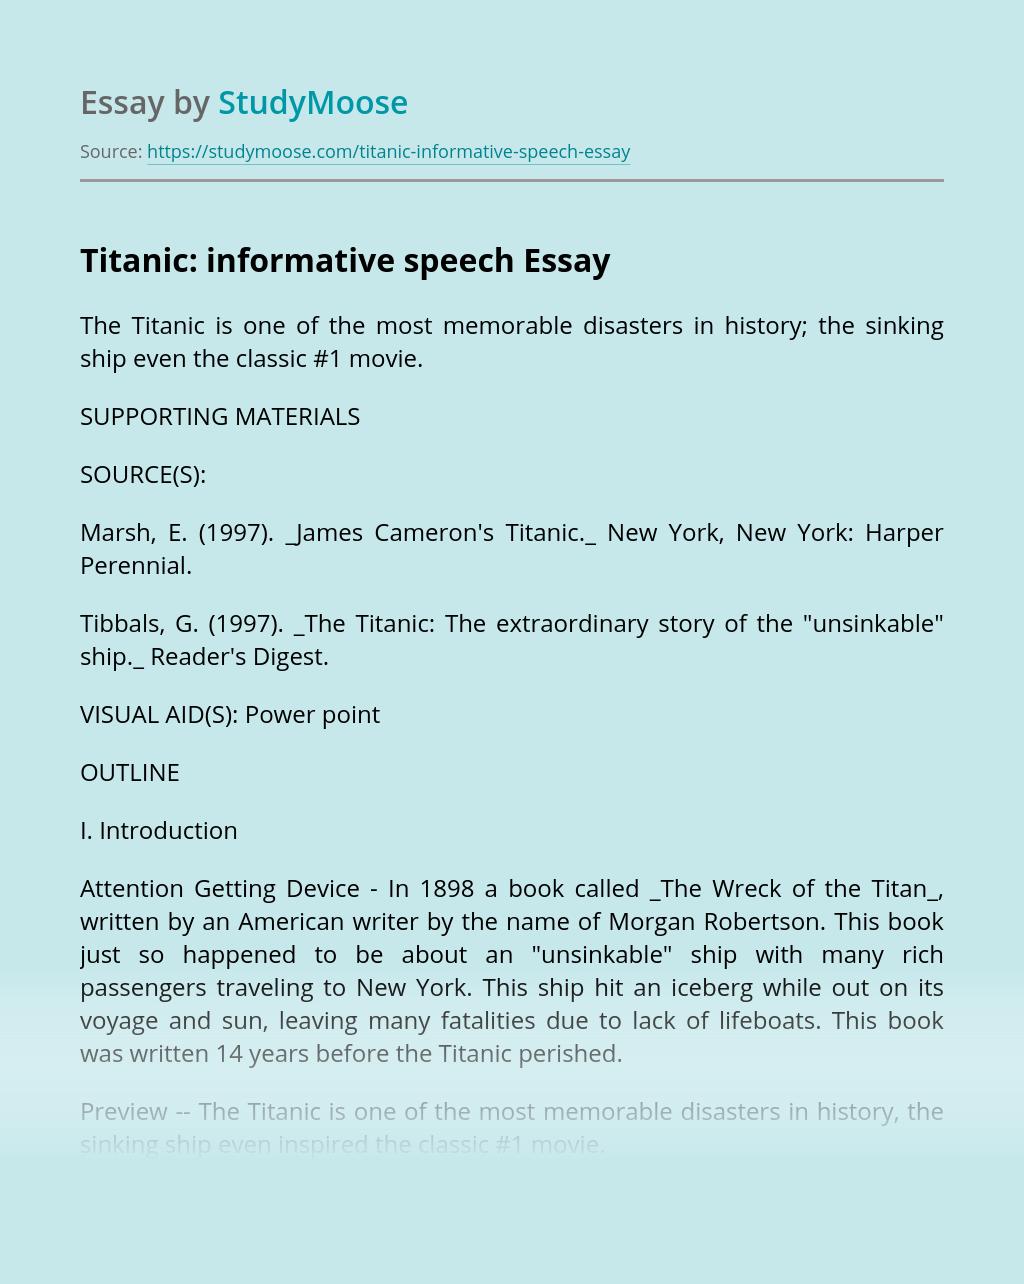 Titanic: Informative Speech